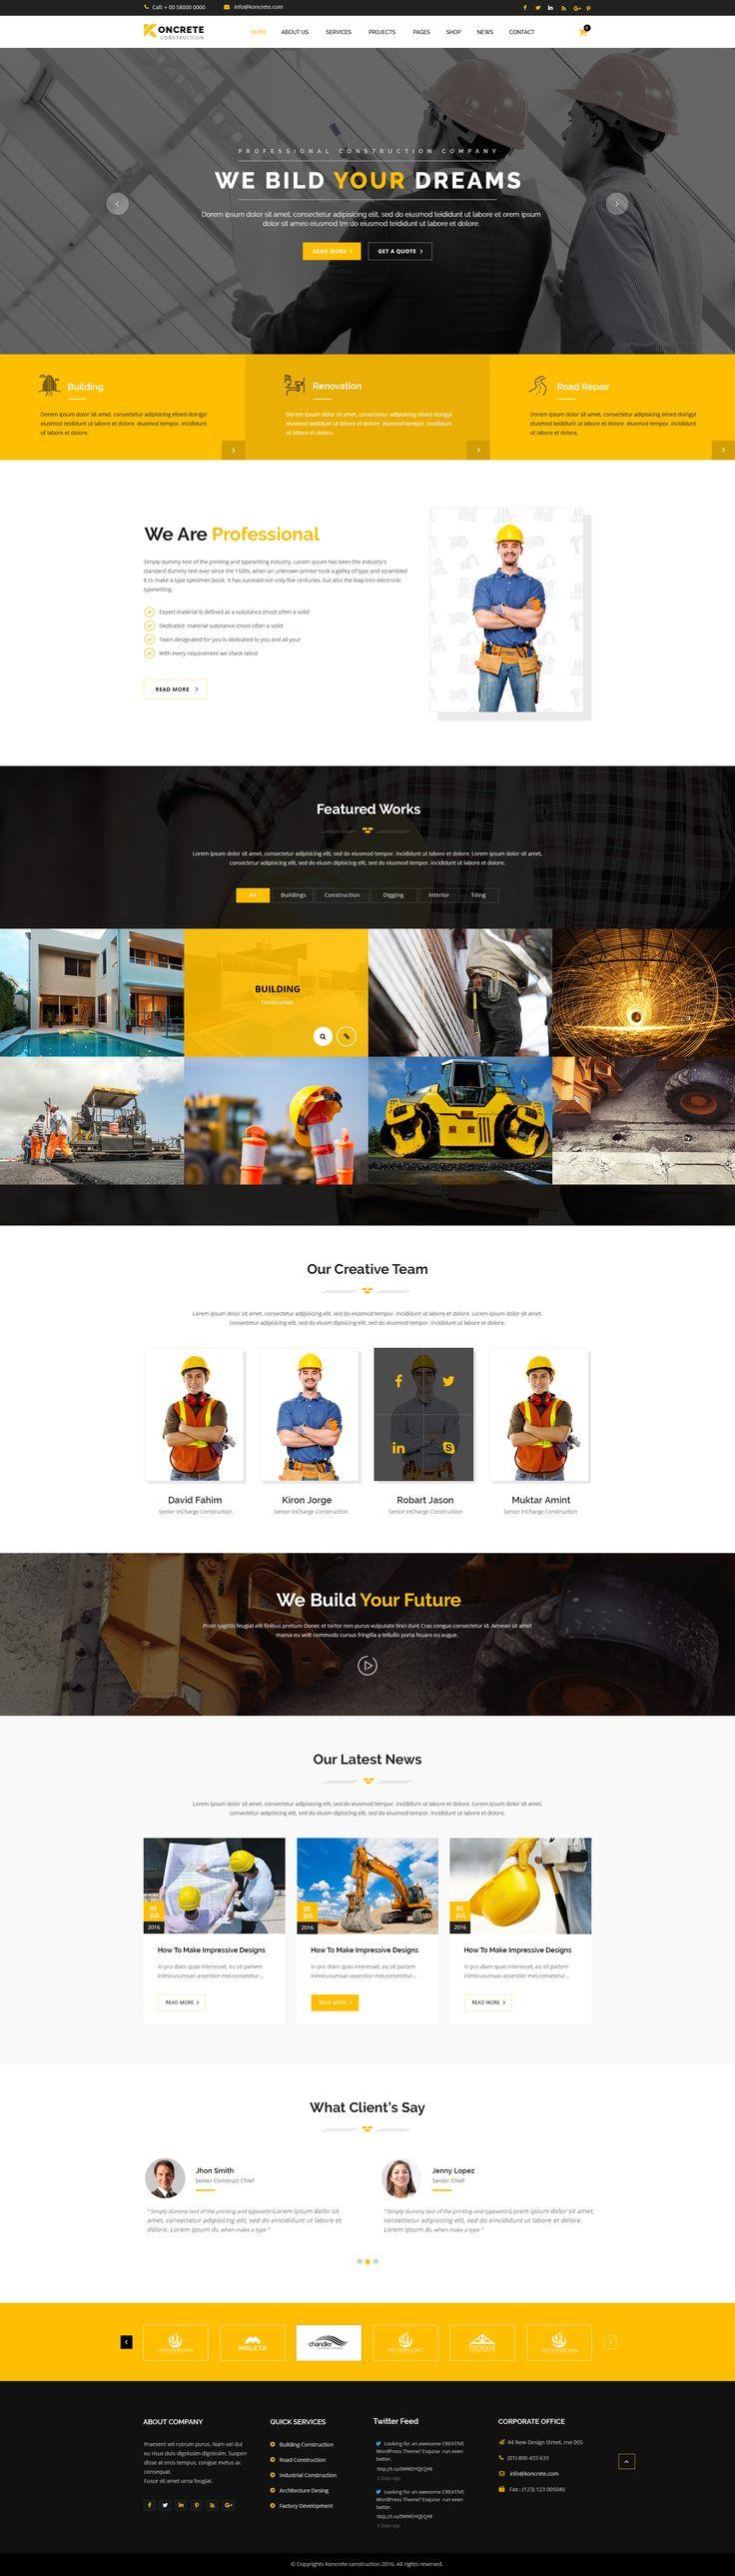 ideas about construction website on pinterest simple web design